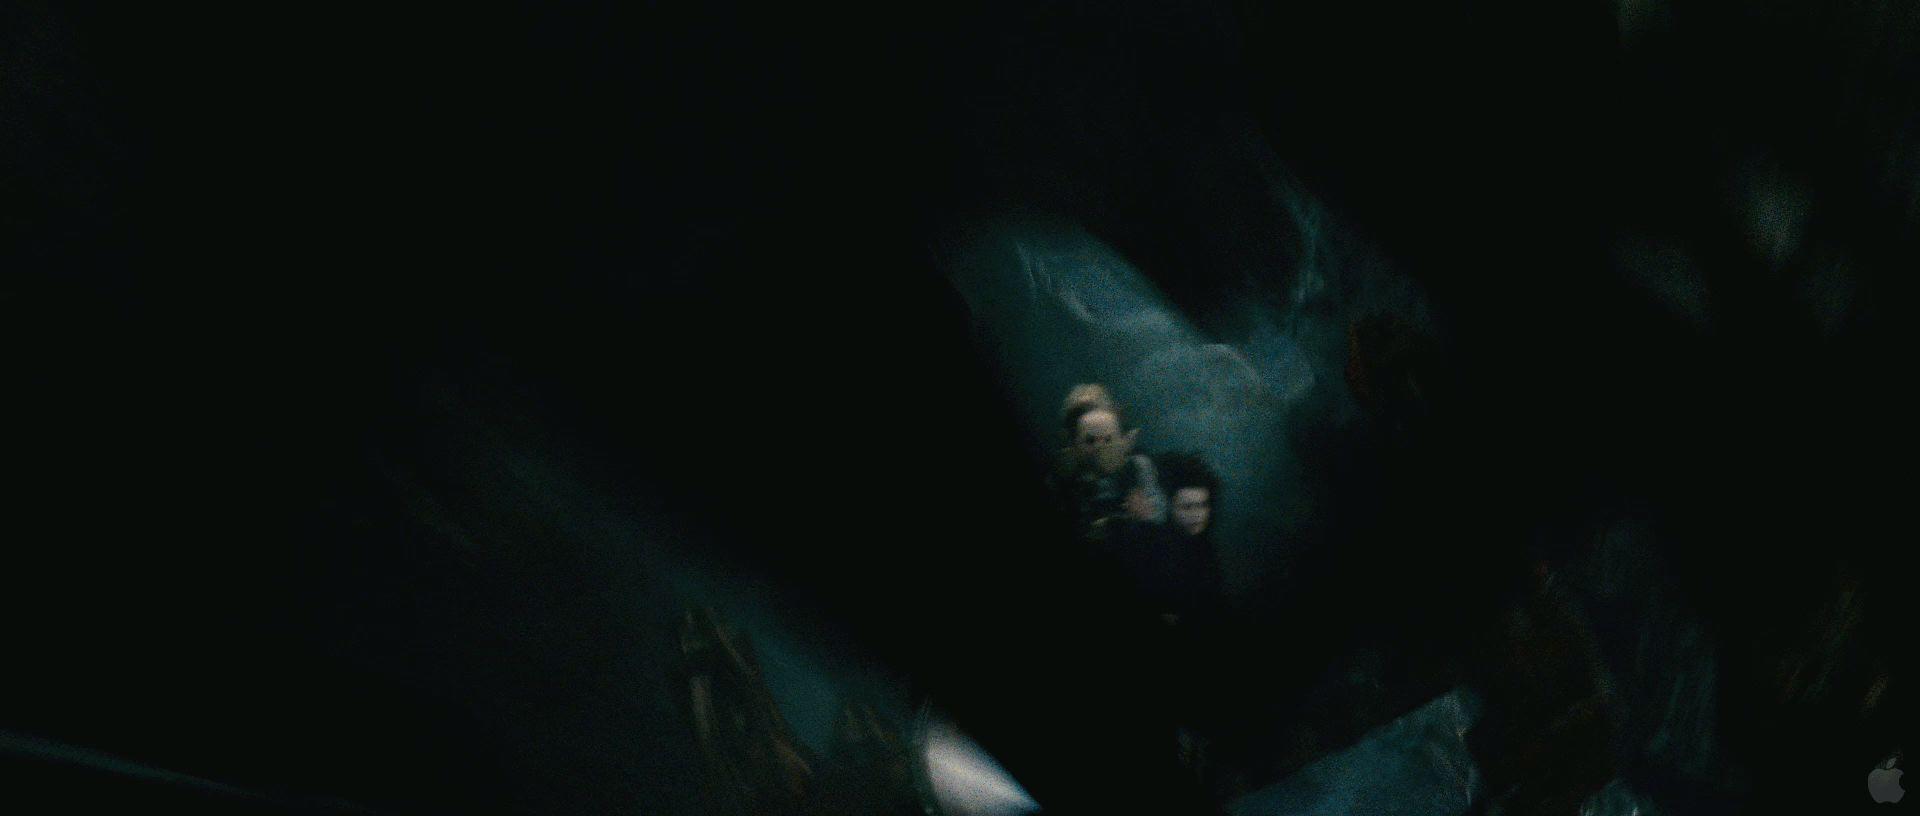 Harry Potter BlogHogwarts HP7 2 Trailer 21